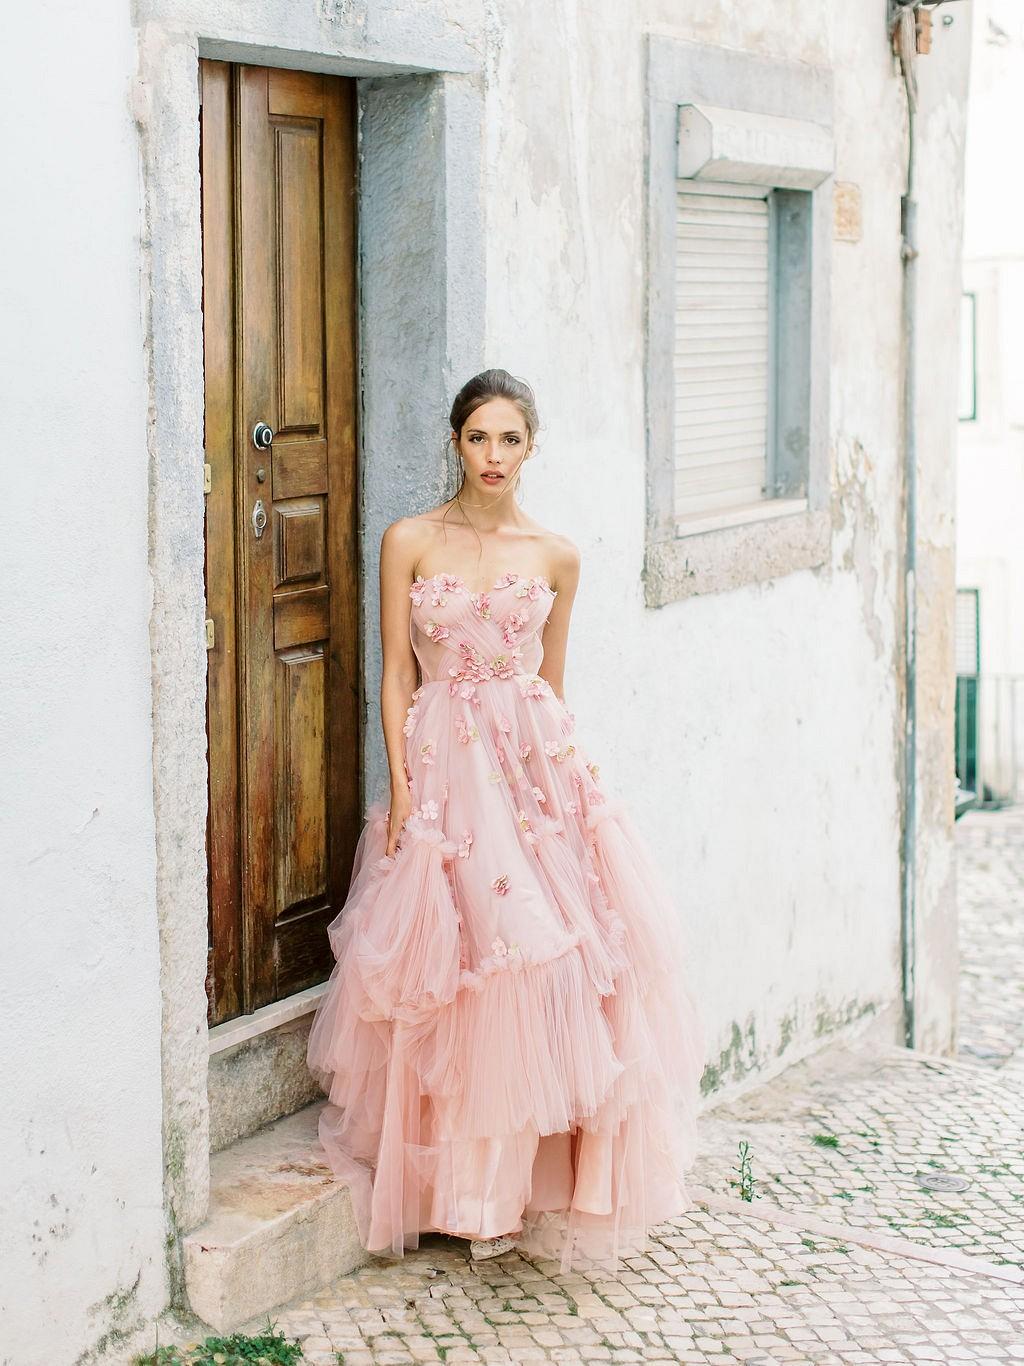 Pale pink wedding dress ideas